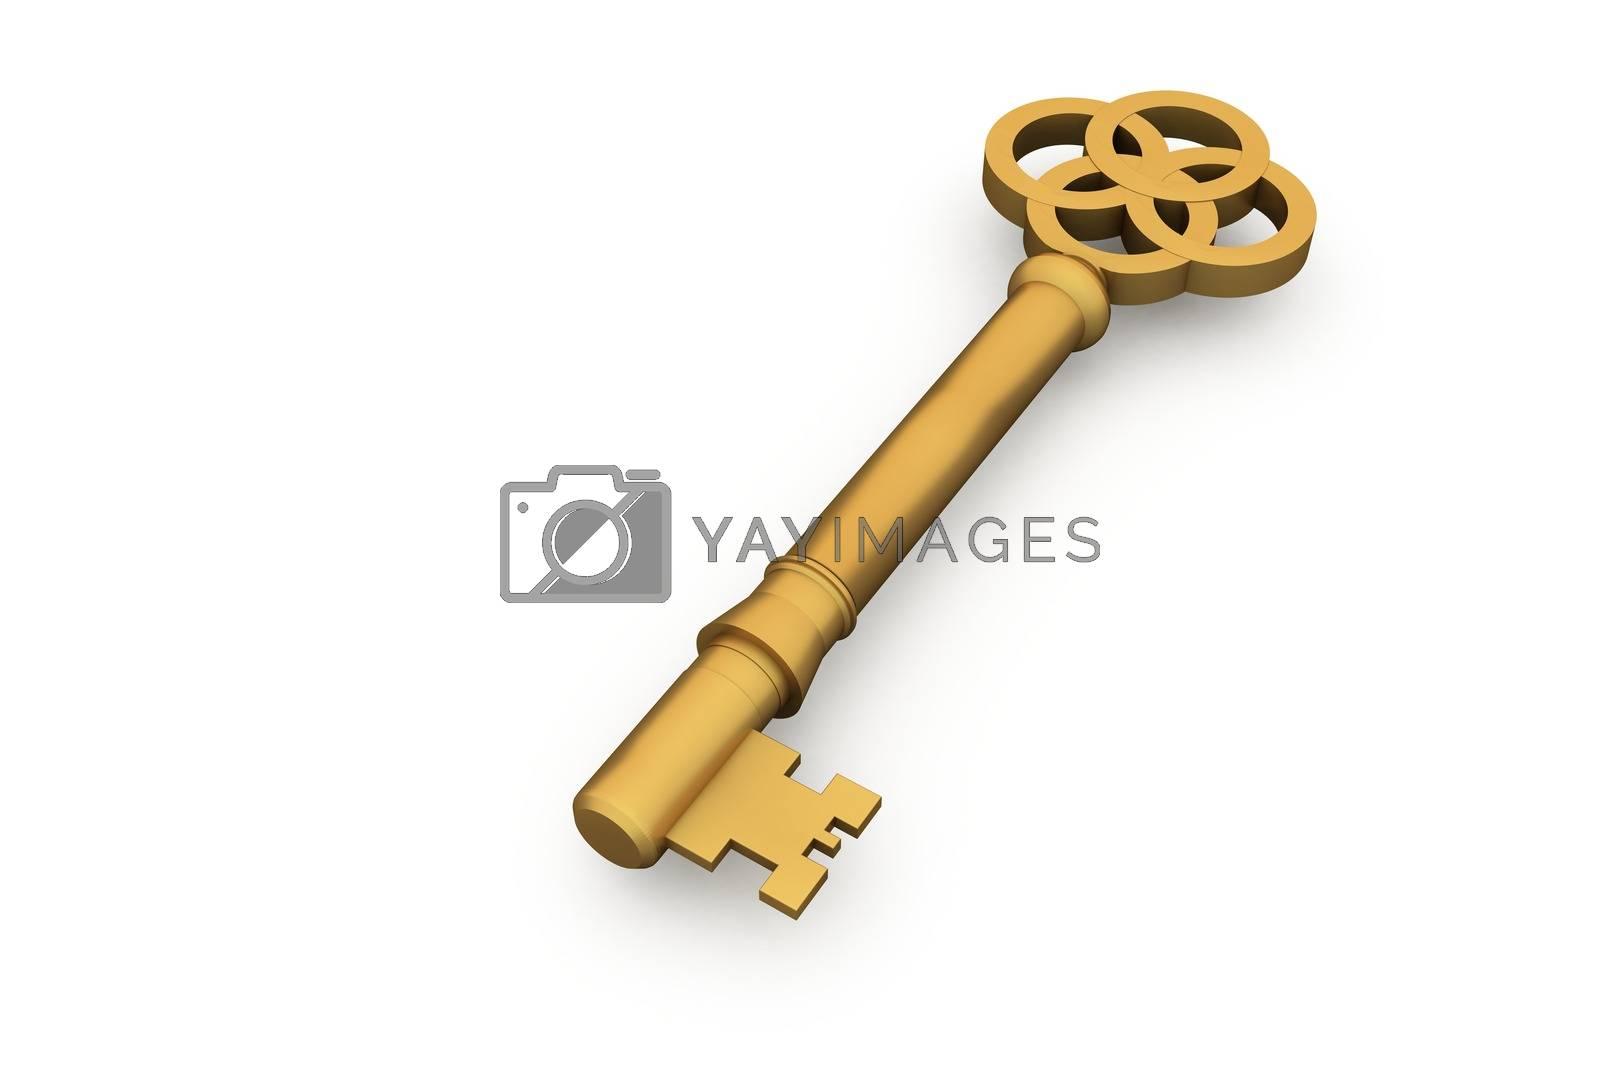 Royalty free image of Digitally generated shiny gold key by Wavebreakmedia